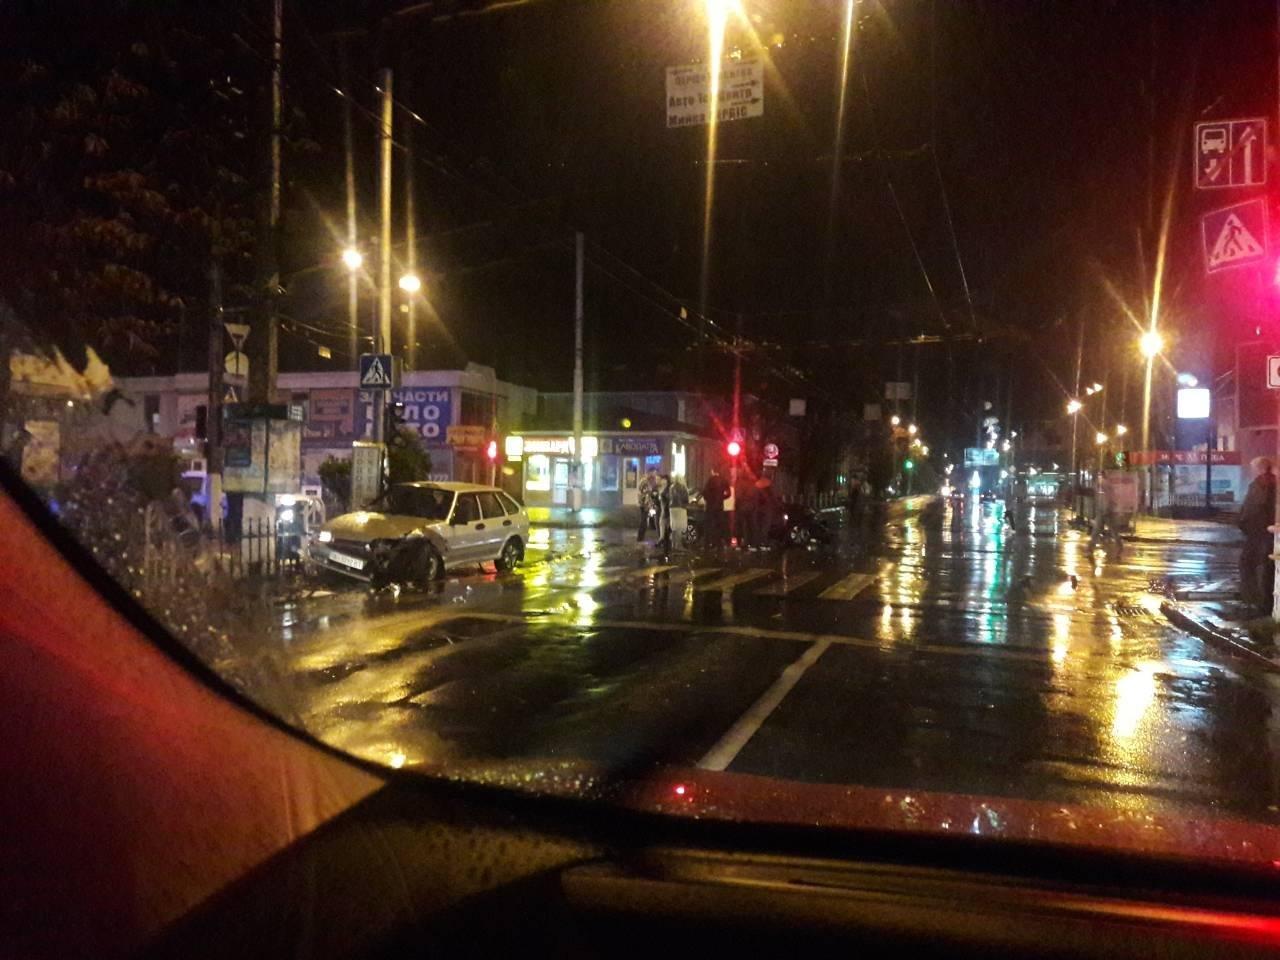 В Кременчуге во время дождя на перекрёстке столкнулись легковушки (ФОТО), фото-2